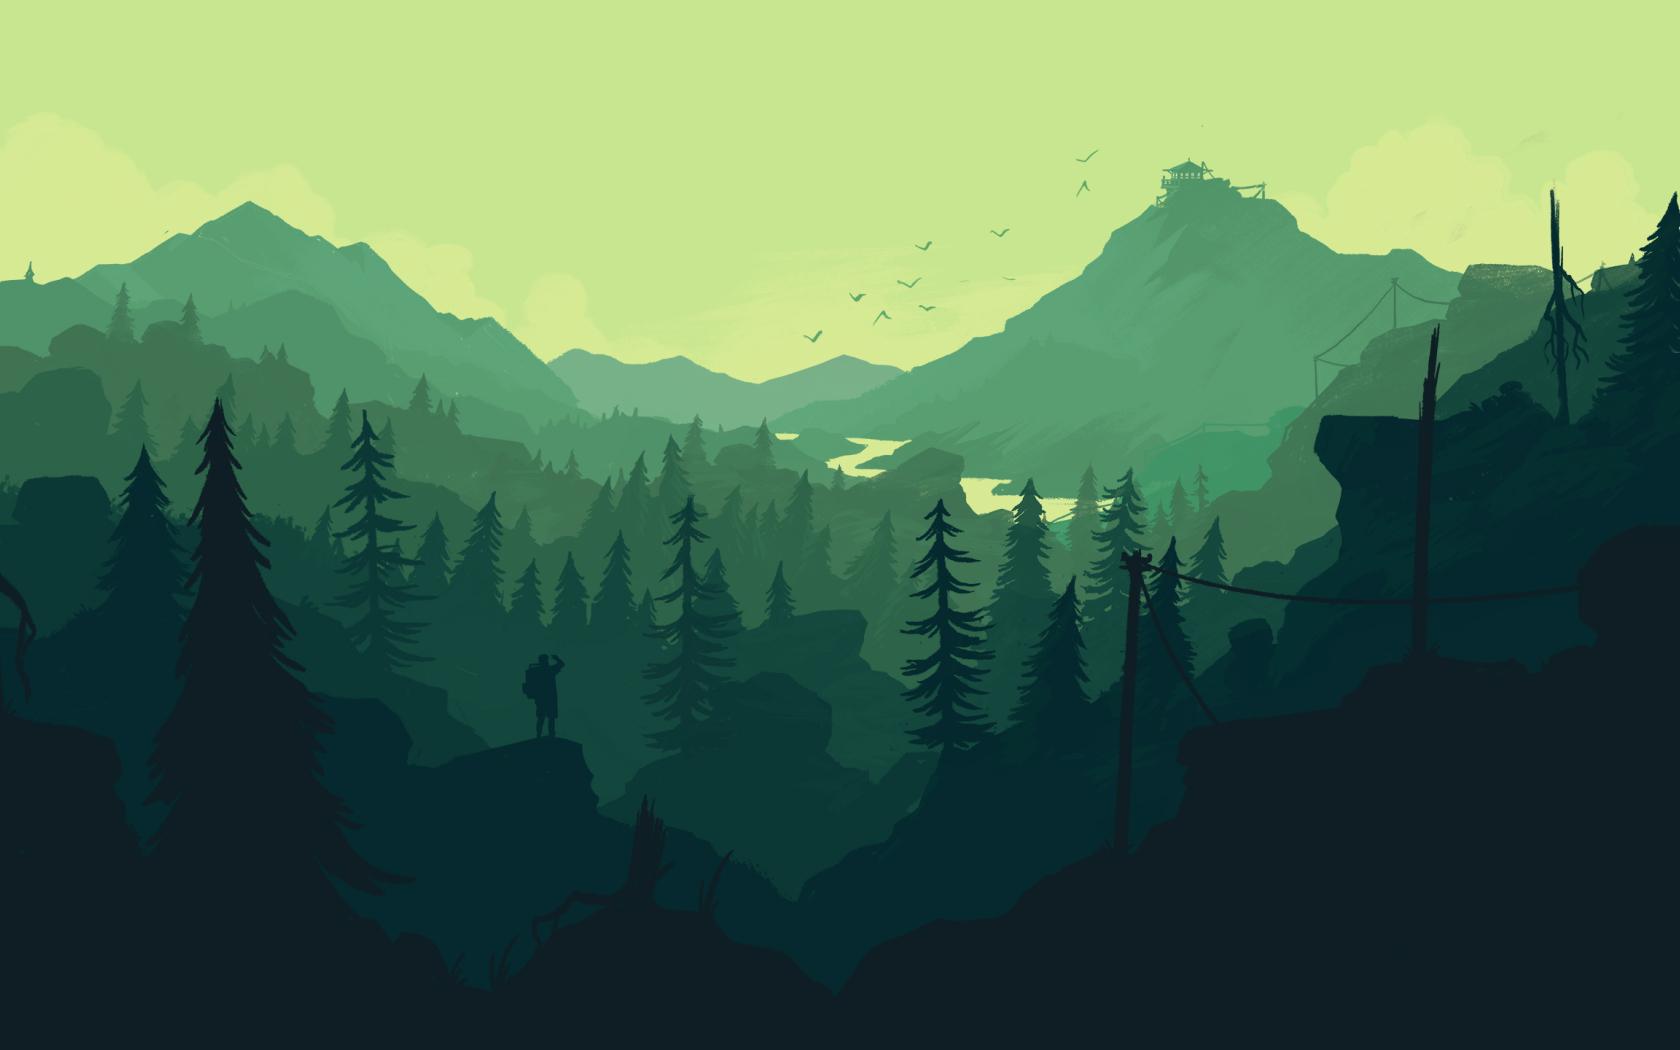 Best Ps Vita Games >> Firewatch Forest Digital Art, Full HD 2K Wallpaper